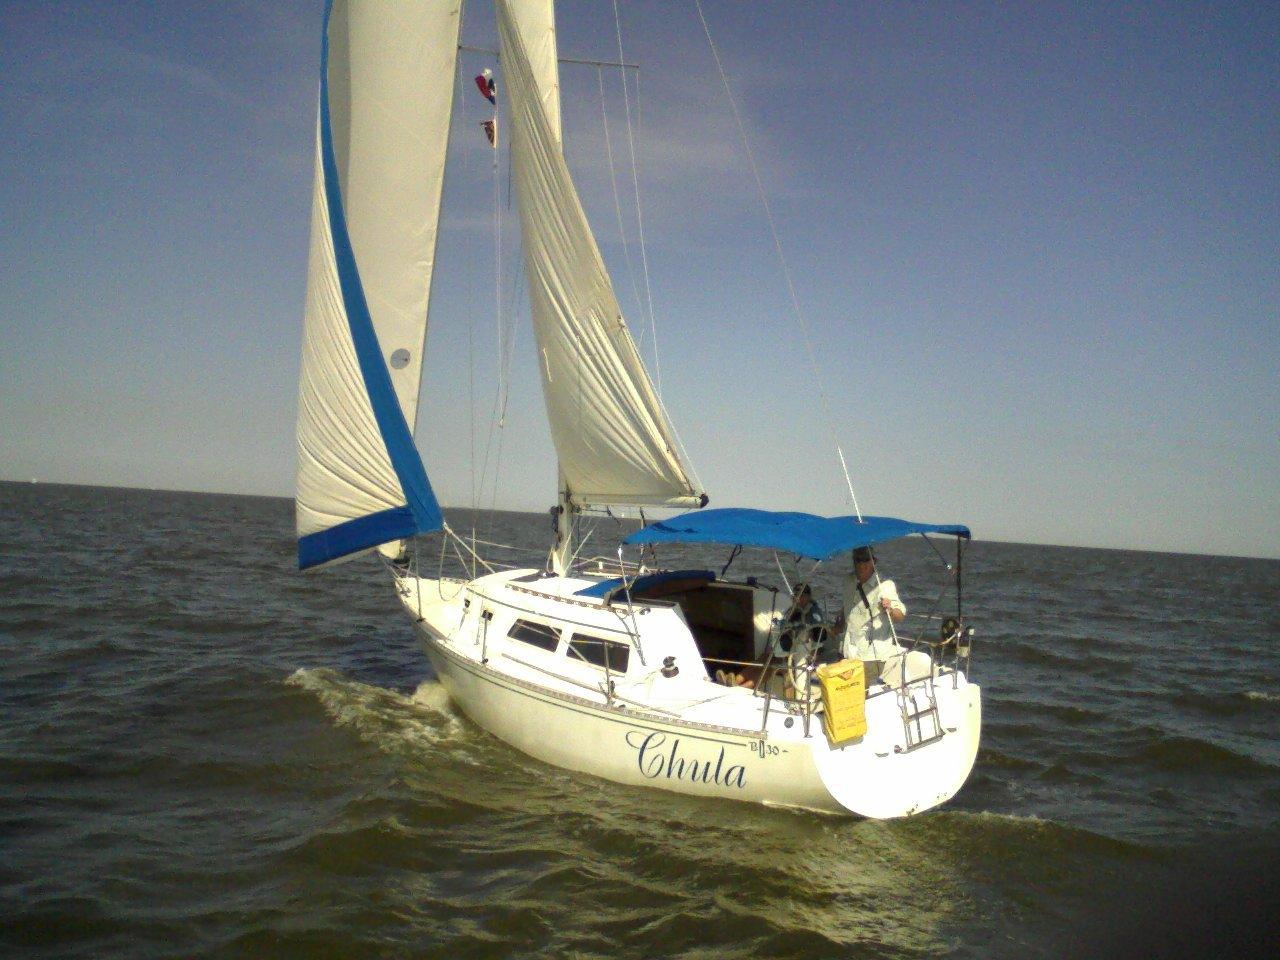 Click image for larger version  Name:Chula Sailing 1.jpg Views:153 Size:189.5 KB ID:2419